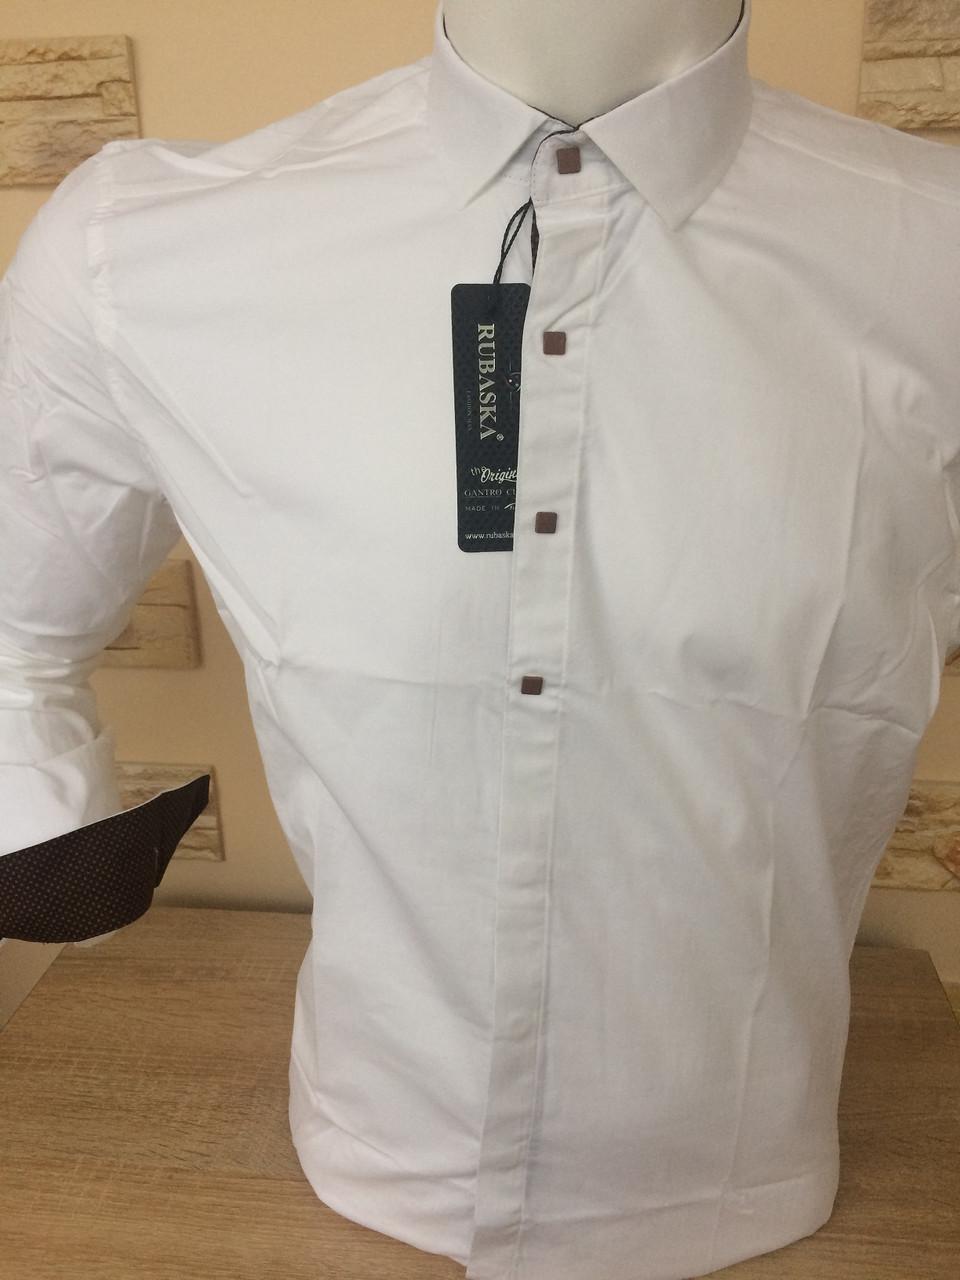 Рубашка длинный рукав Rubaska айвори